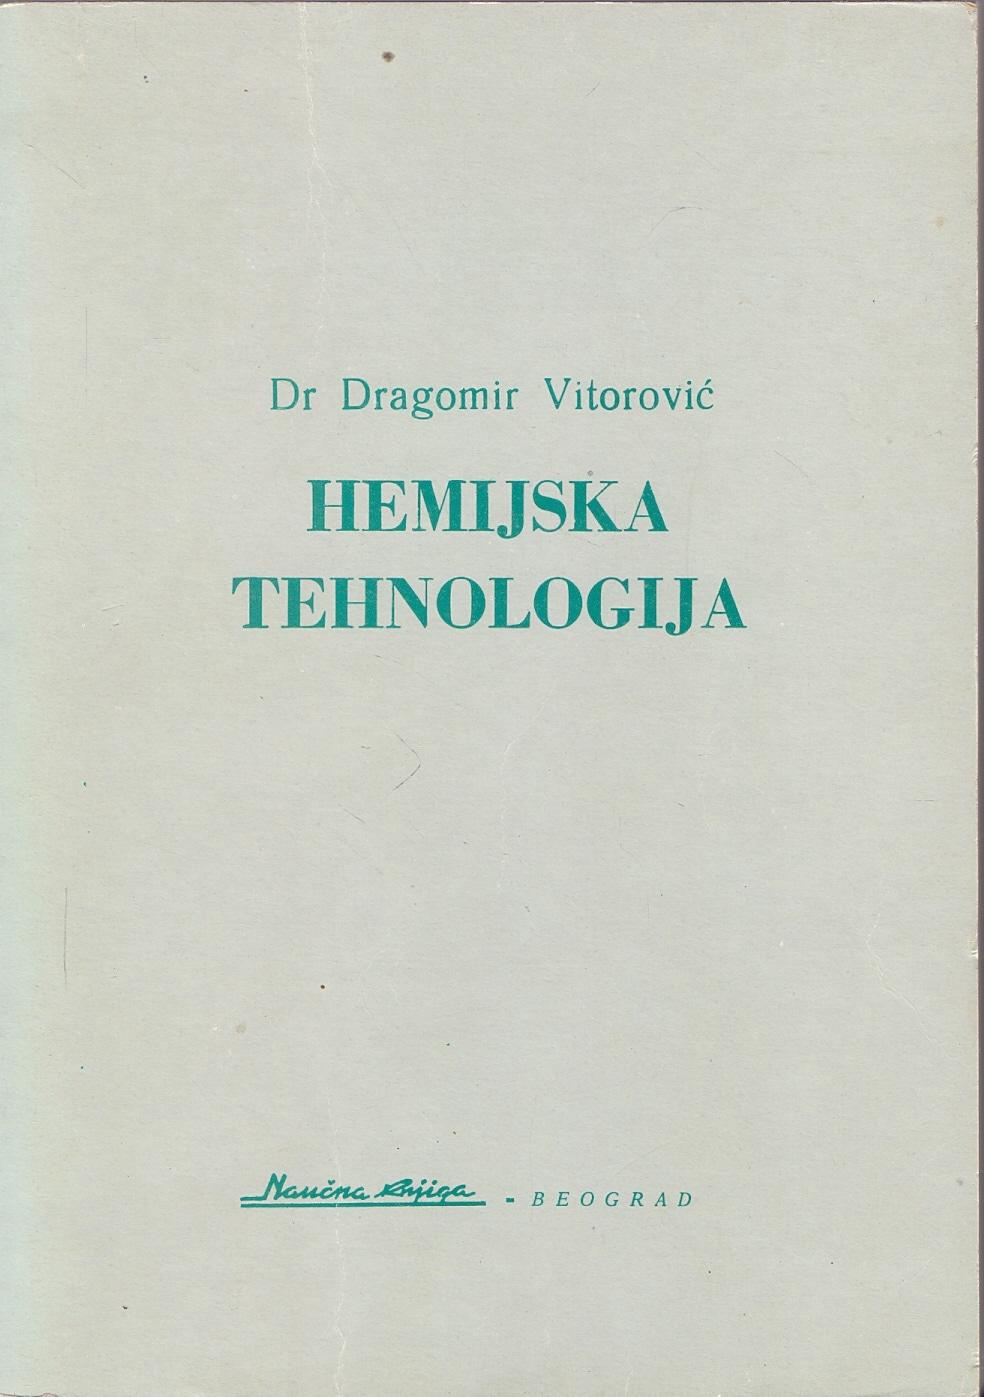 Dragomir Vitorović - Hemijska tehnologija